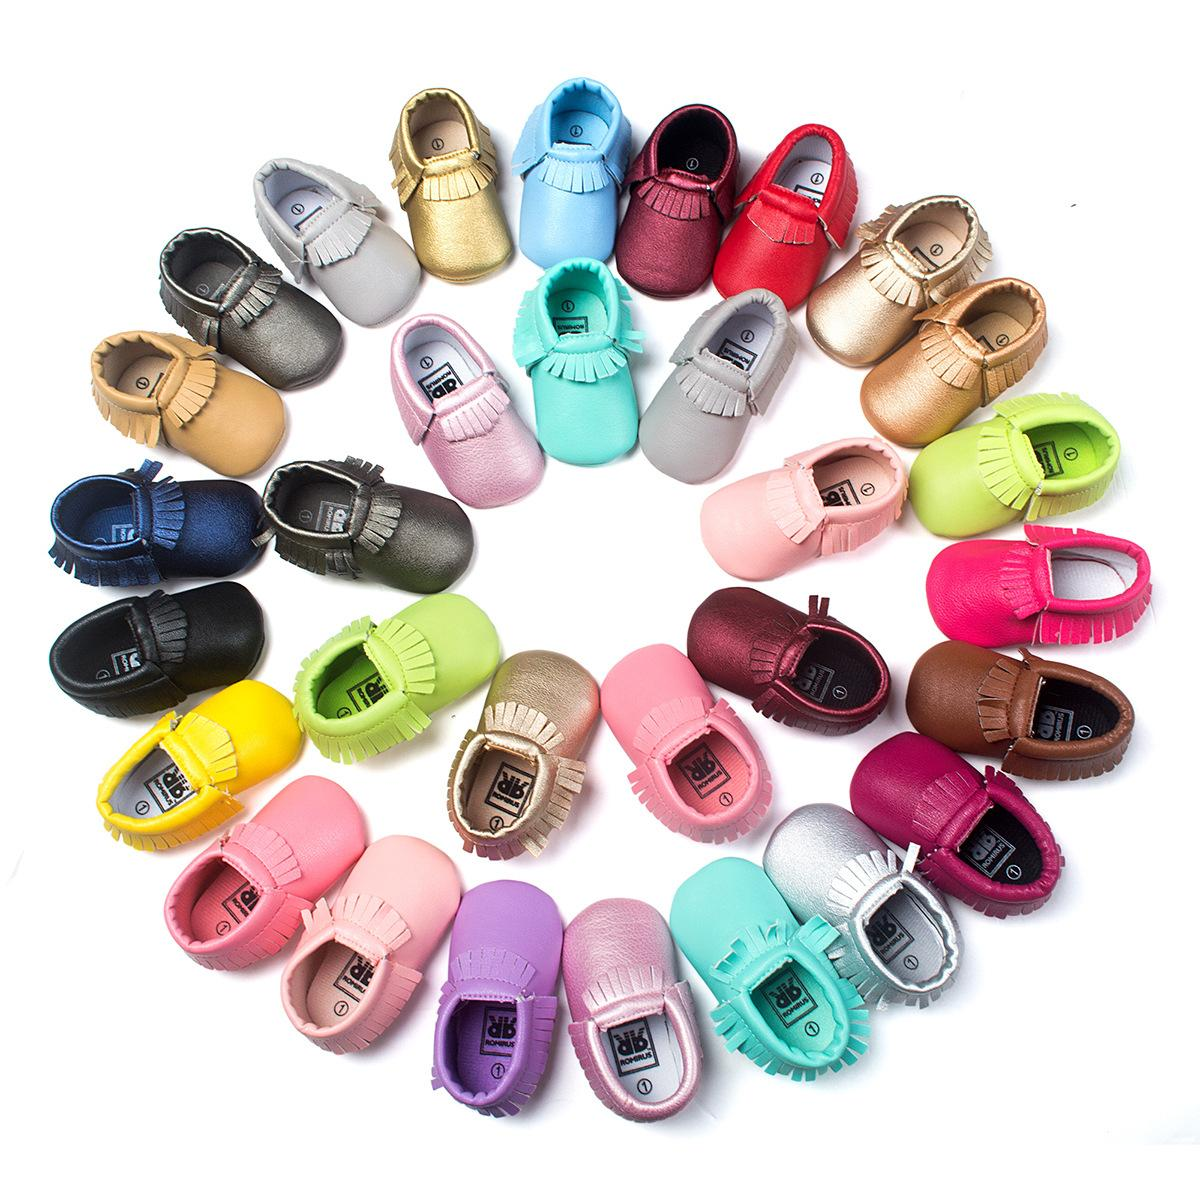 2016 New Style Newborn Baby Infant Toddler Kids Prewalker Suede Shoes Baby Moccasins Soft Moccs Soft Soled Anti-slip Footwear